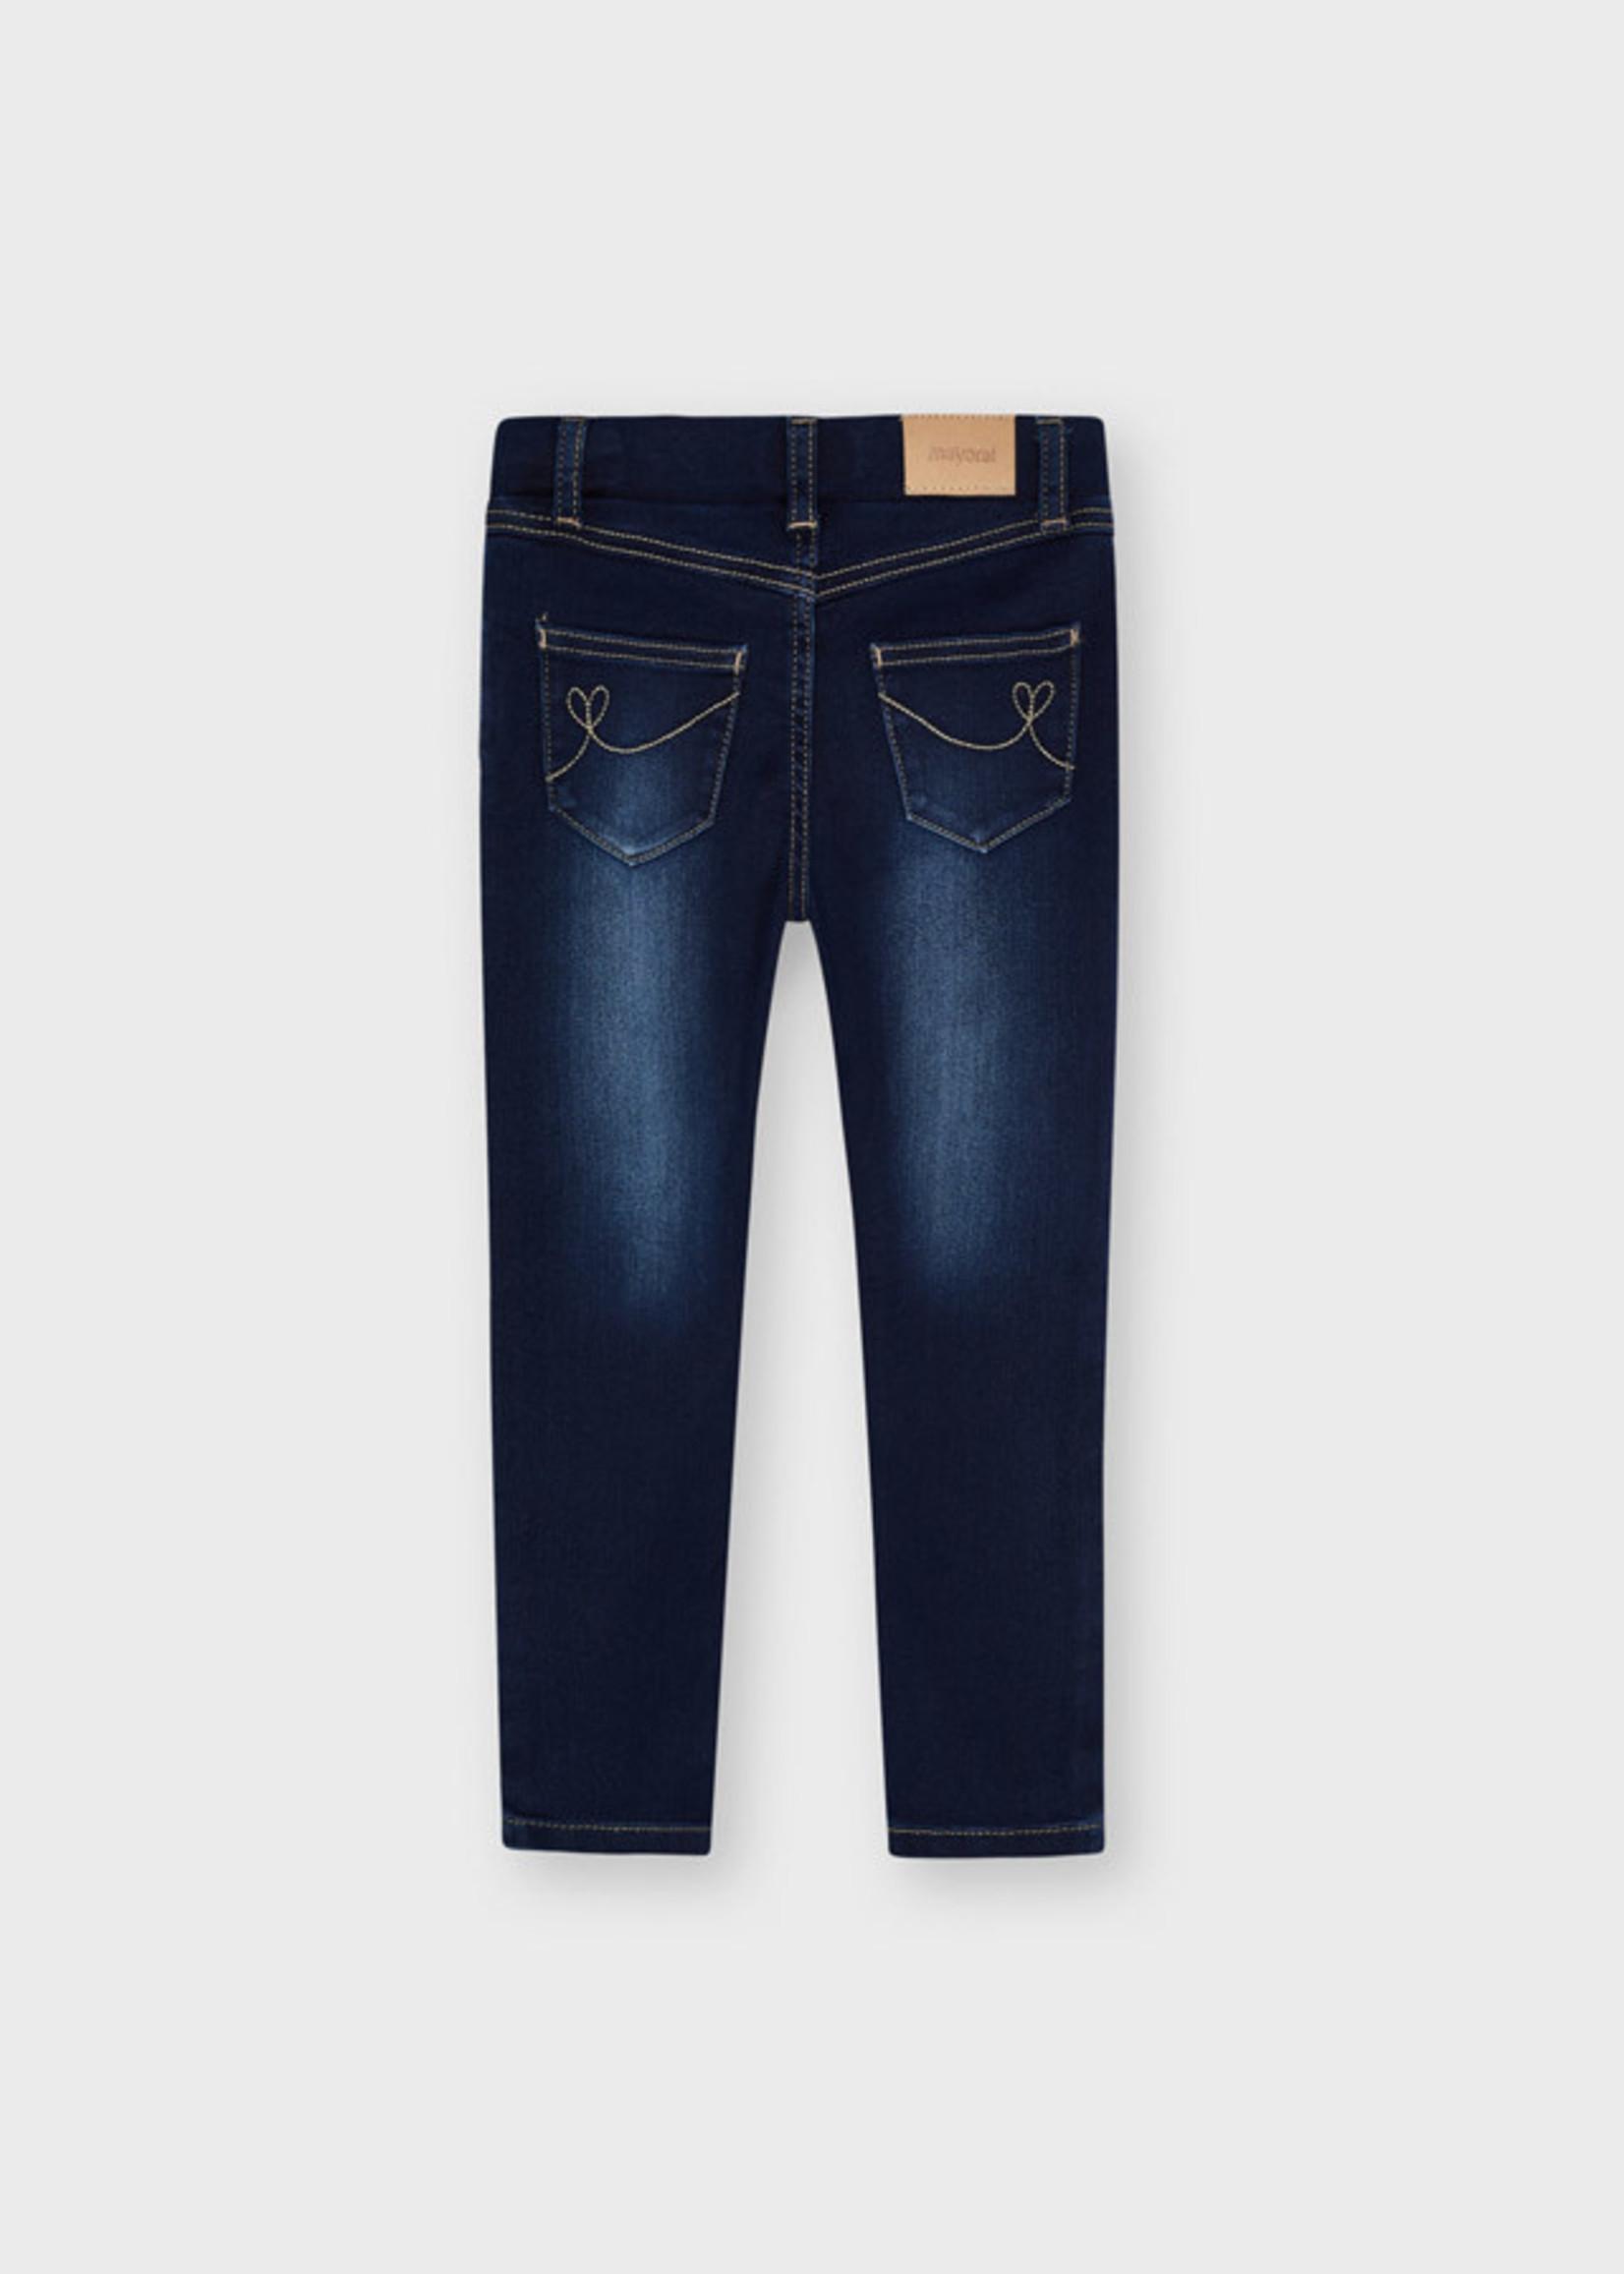 MAYORAL MAYORAL Jeans basic denim dark rekker